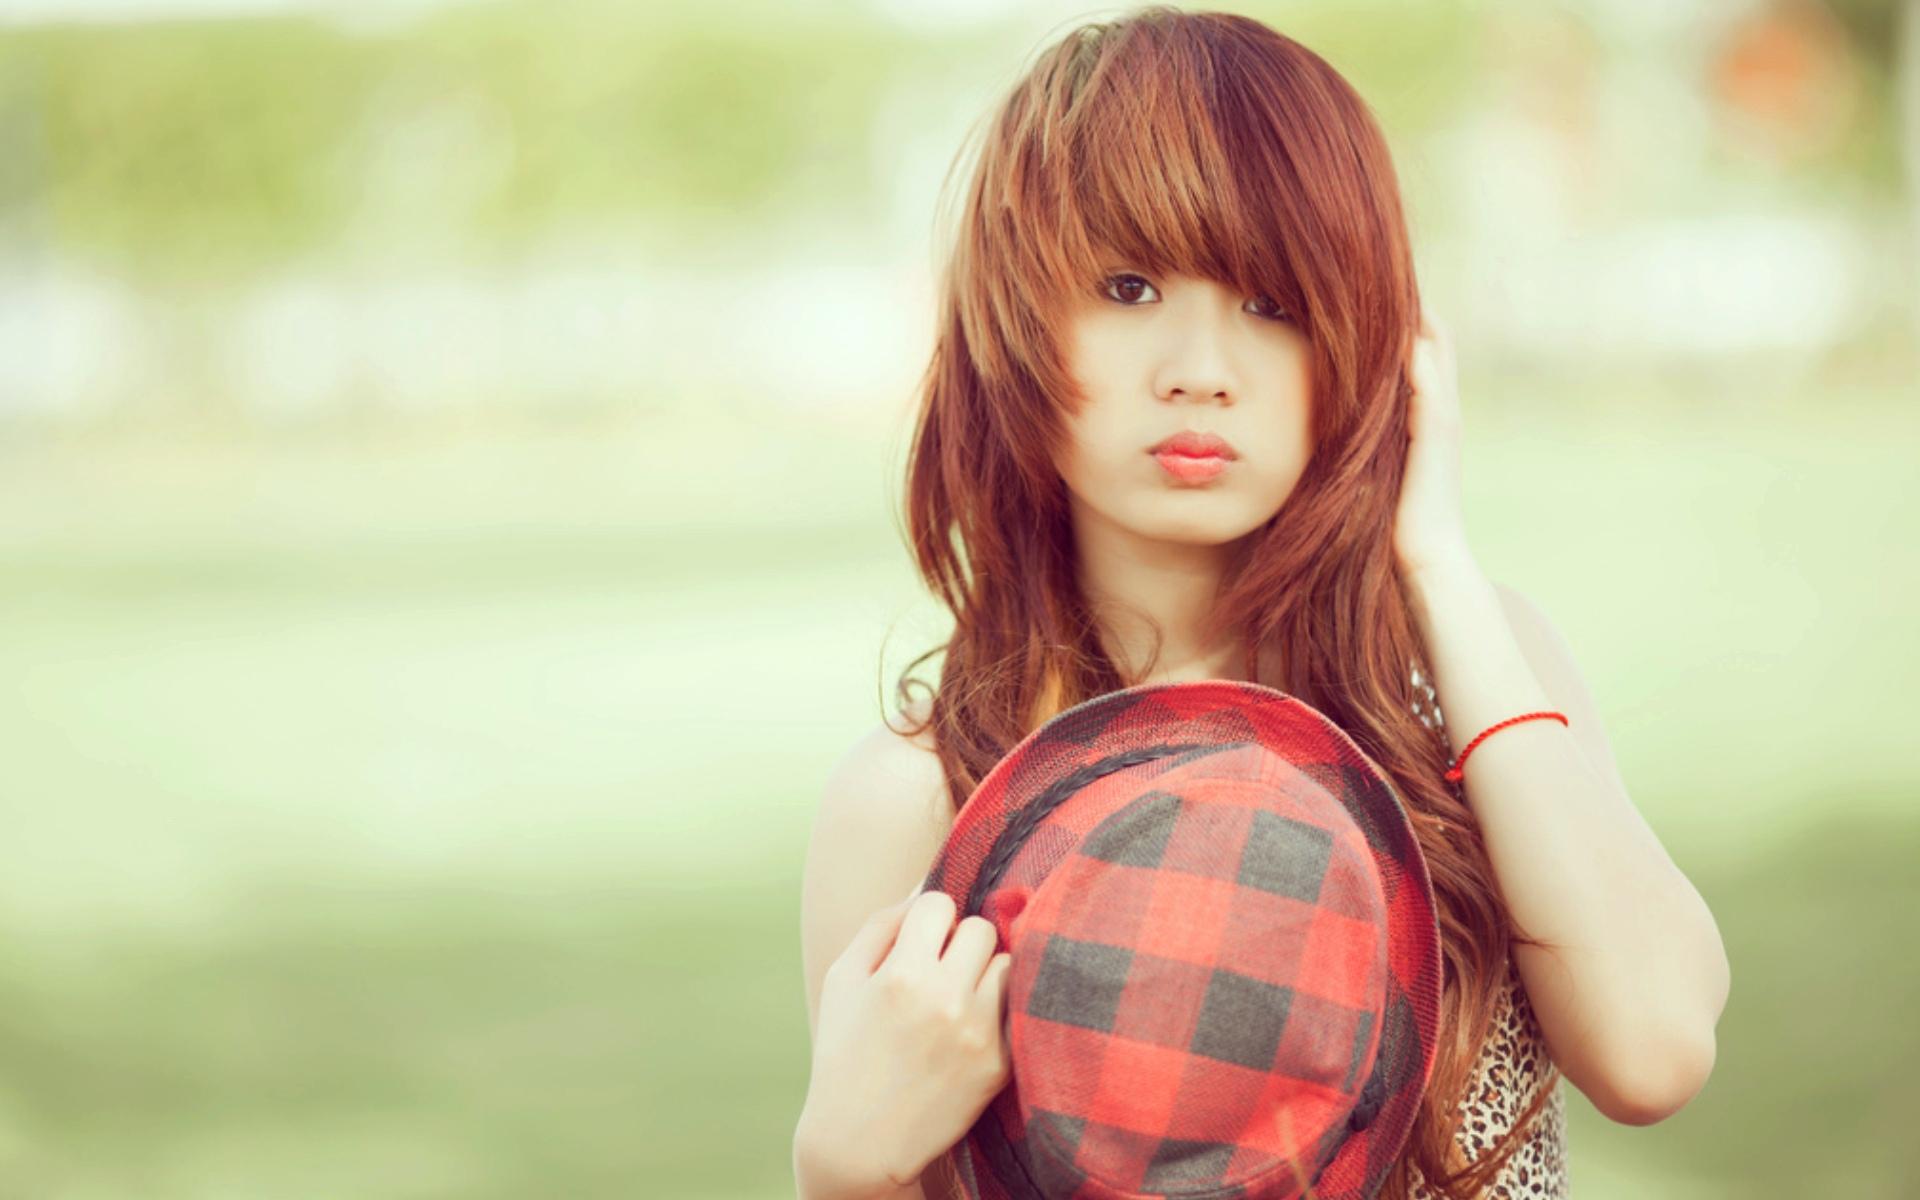 Hd wallpaper cute girl - Very Cute Girl With Hat 1920x1200 13044 Hd Wallpaper Res 1920x1200